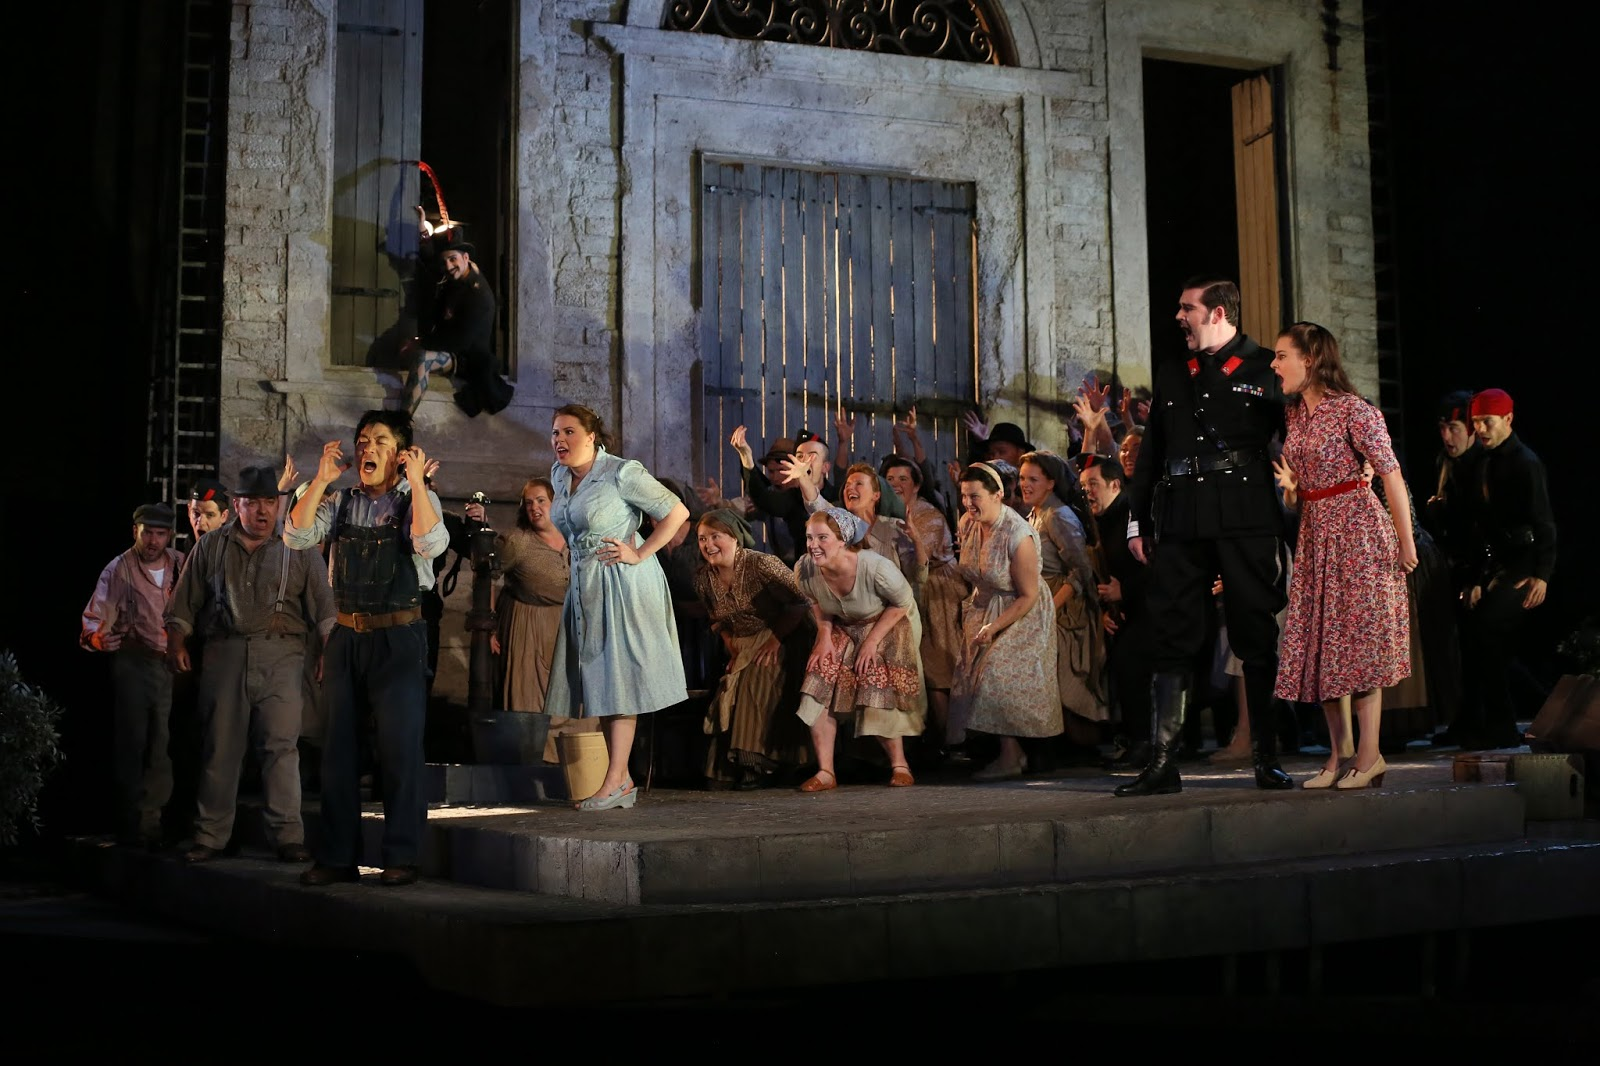 Nemorino (Sehoon Moon), Giannetta (Carrie-Ann Williams), Belcore (Matthew Durkan), Adina (Benedetta Torre) and Glyndebourne Chorus